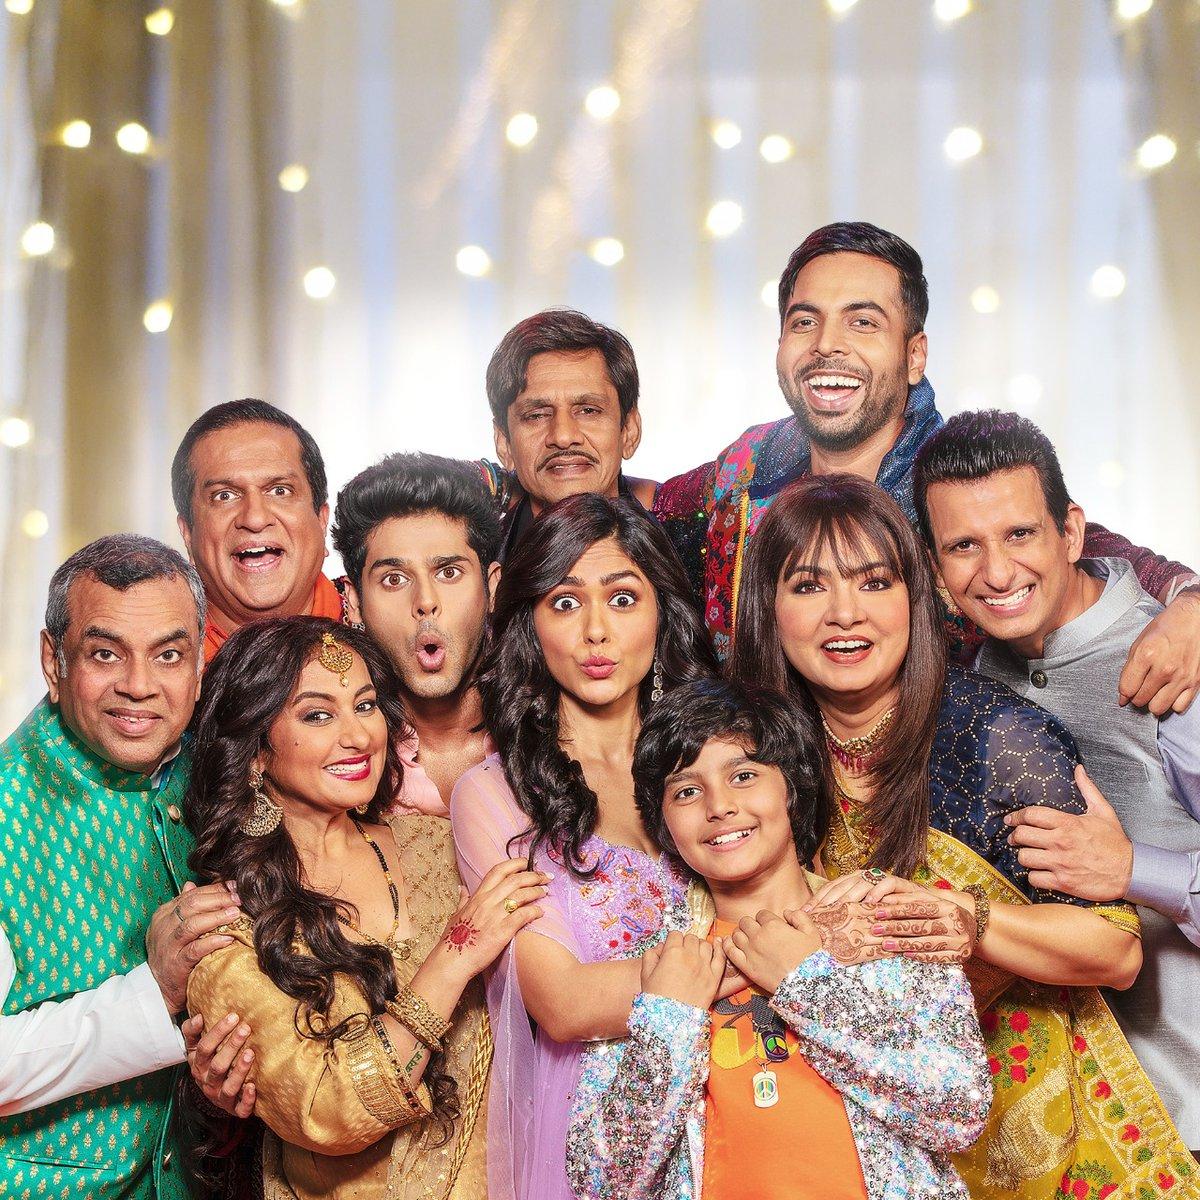 Sony Pictures Films India & director Umesh Shukla [#102NotOut & #OhMyGod] team up for a family entertainer #AankhMicholi stars Abhimanyu, Mrunal Thakur, Paresh Rawal, Sharman Joshi, Divya Dutta, Vijay Raaz & Abhishek Banerjee. #Diwali2020 release will be shot in India & Europe.pic.twitter.com/csrUPQS2bW